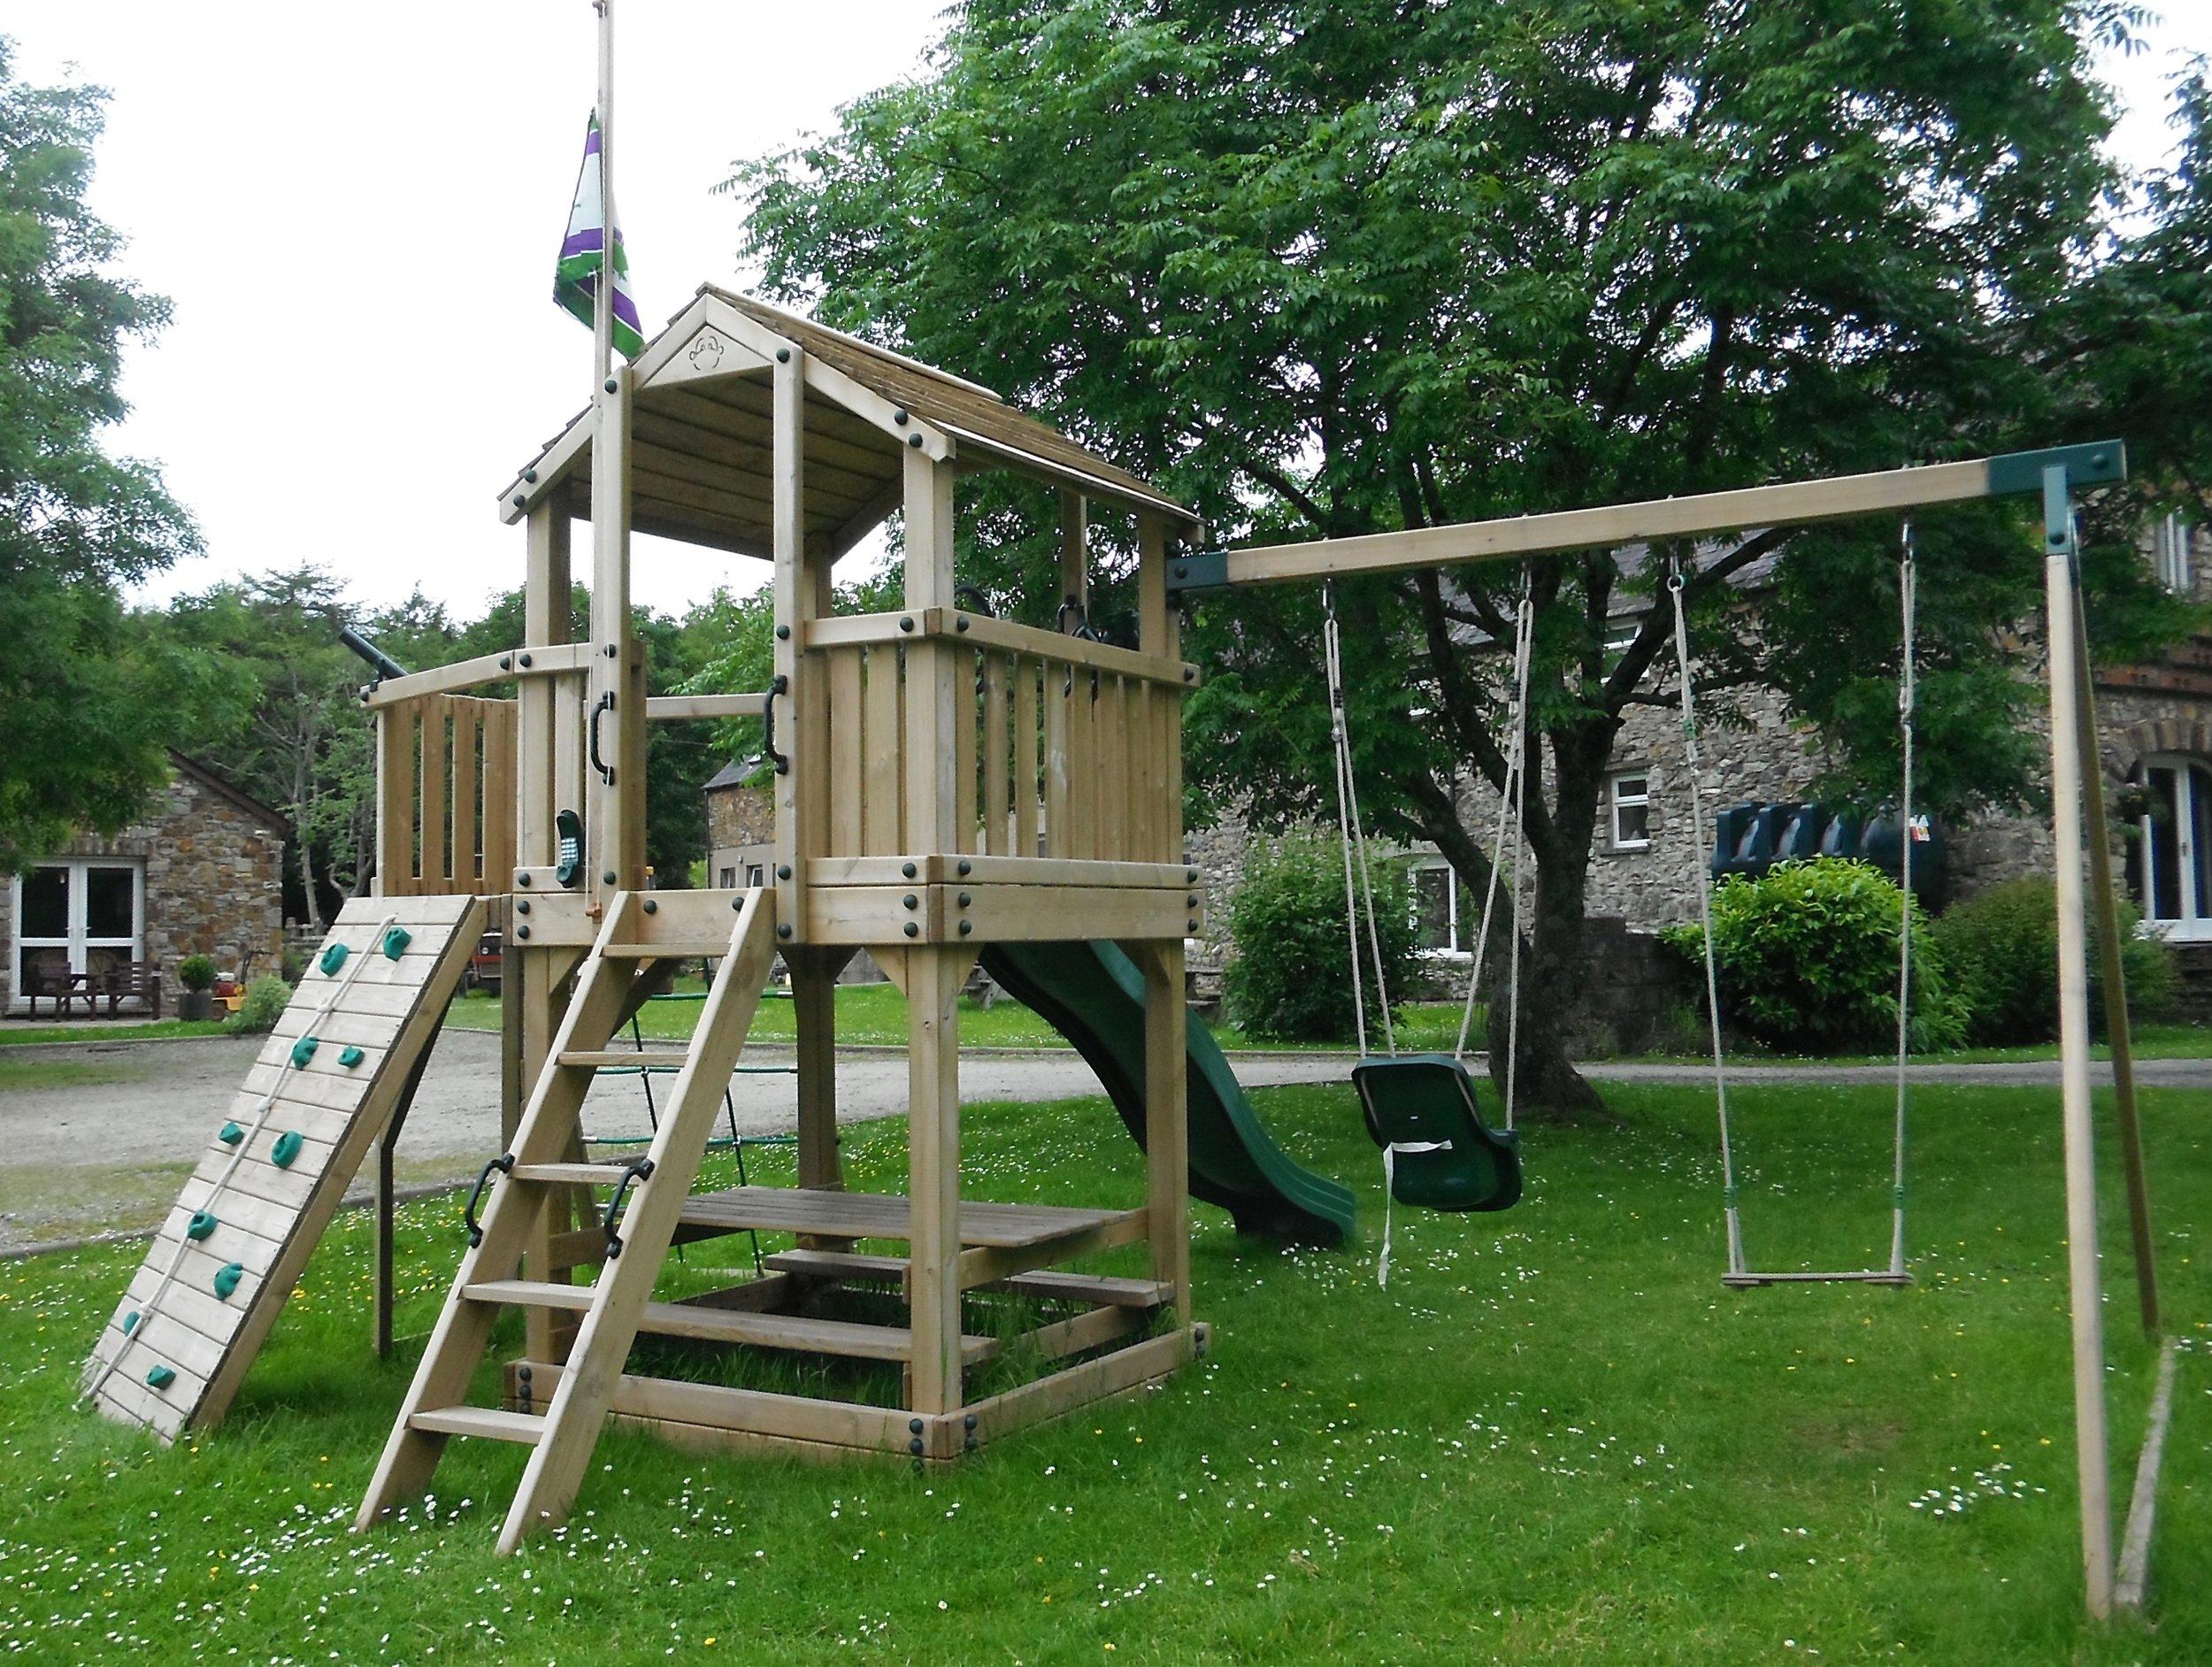 Scolton's adventure playground.